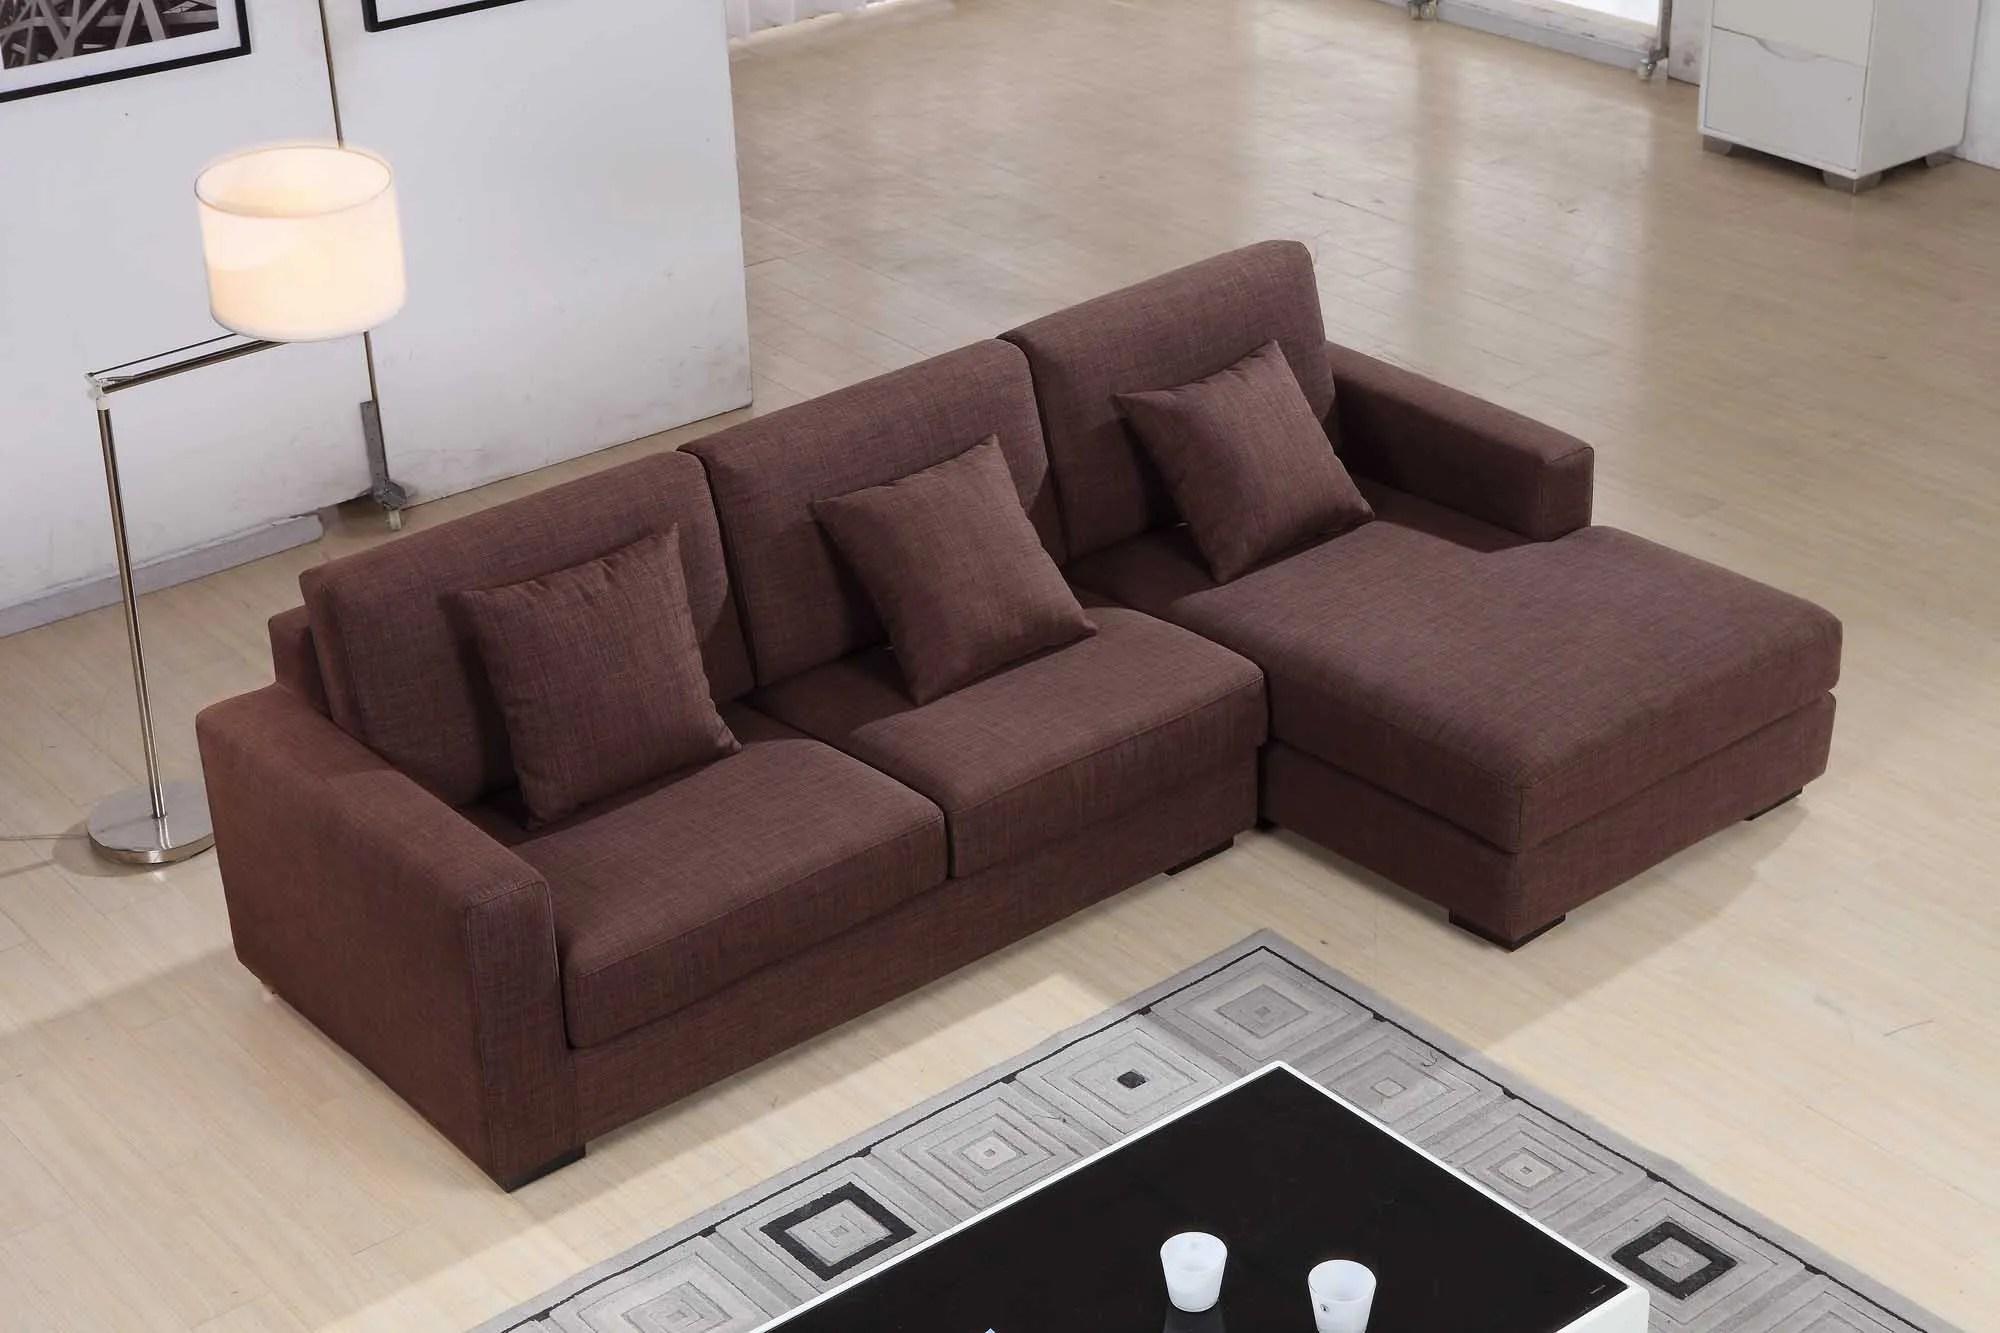 brown l shaped fabric sofa 4 seat buy l shaped fabric sofa fabric sofa 4 seat brown sofa product on alibaba com